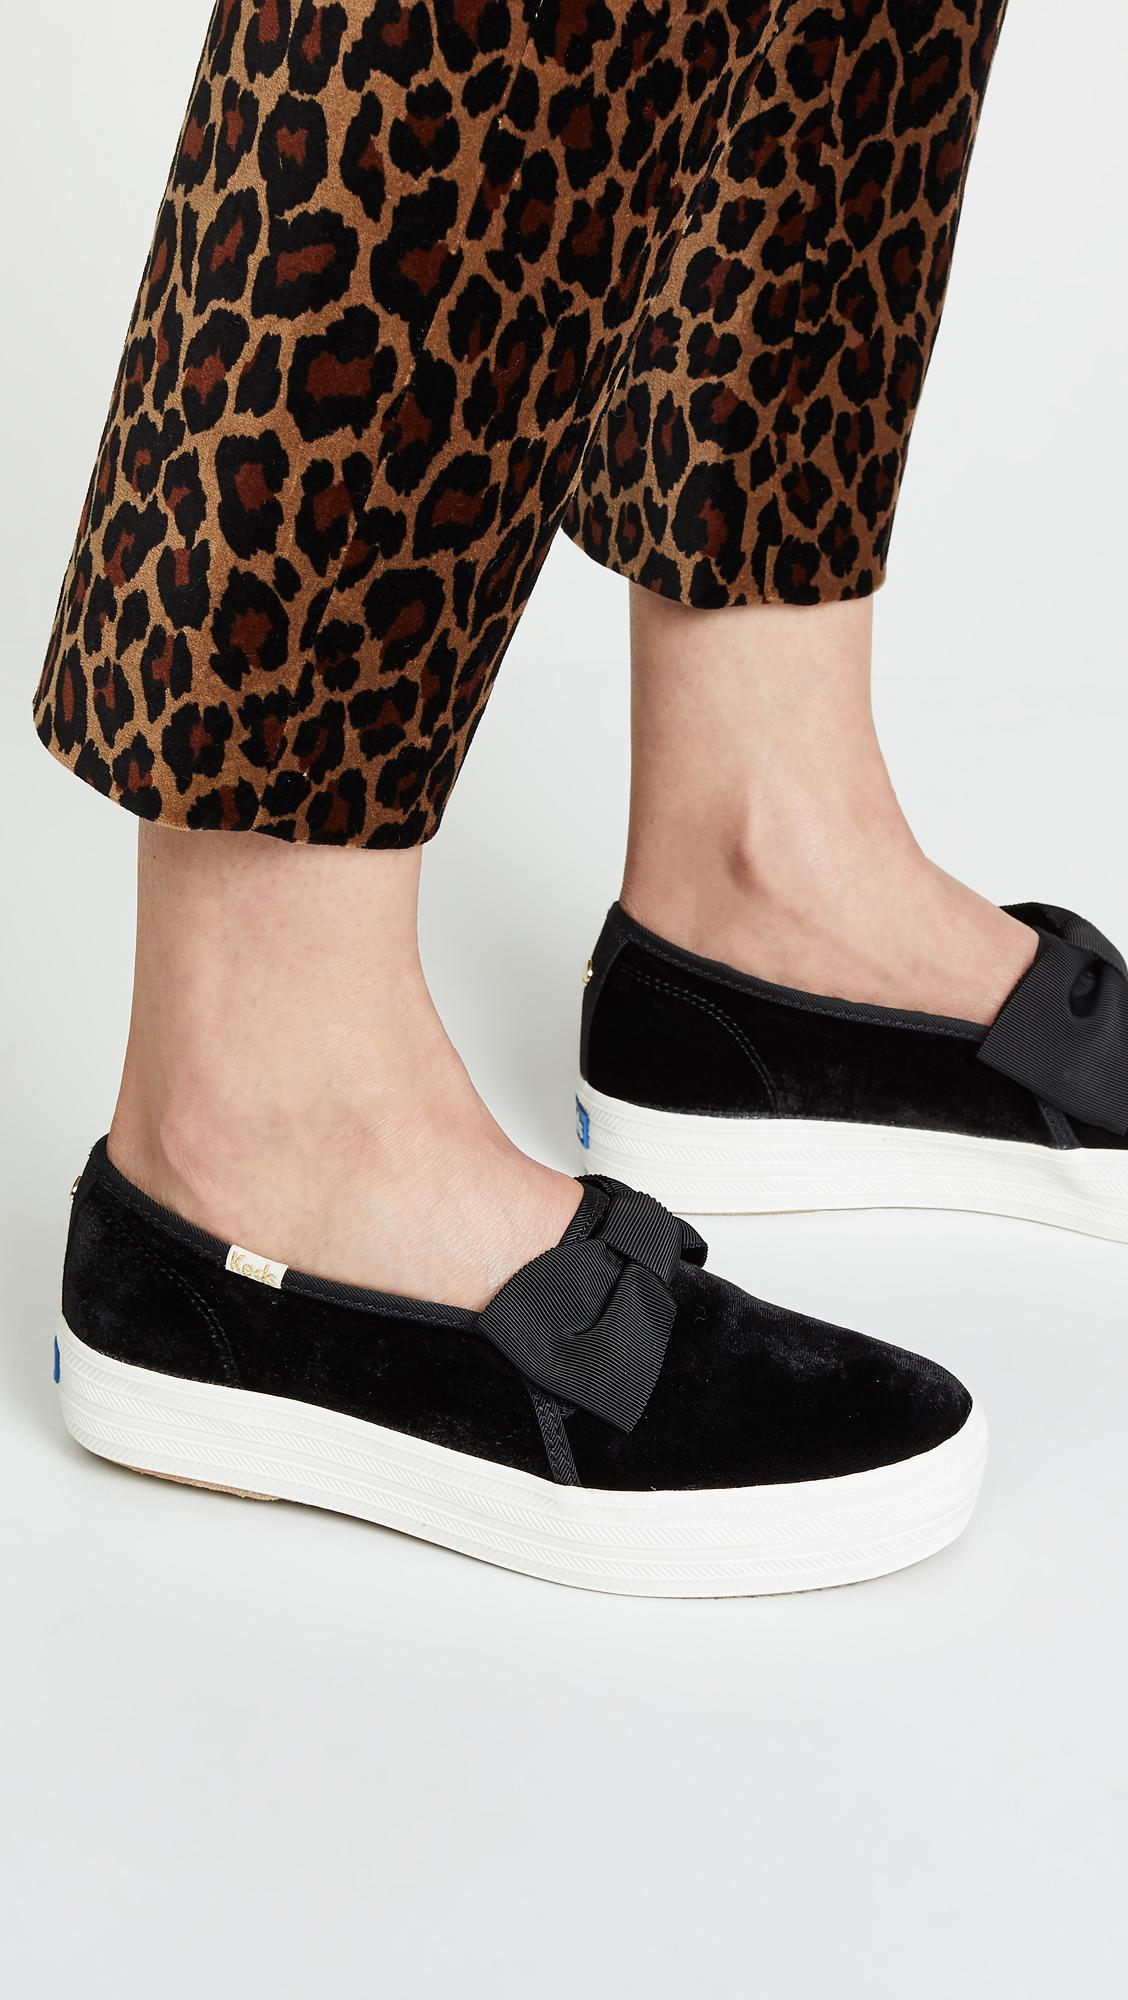 025d800c7 Keds X Kate Spade New York Triple Decker Sneakers in Black - Lyst